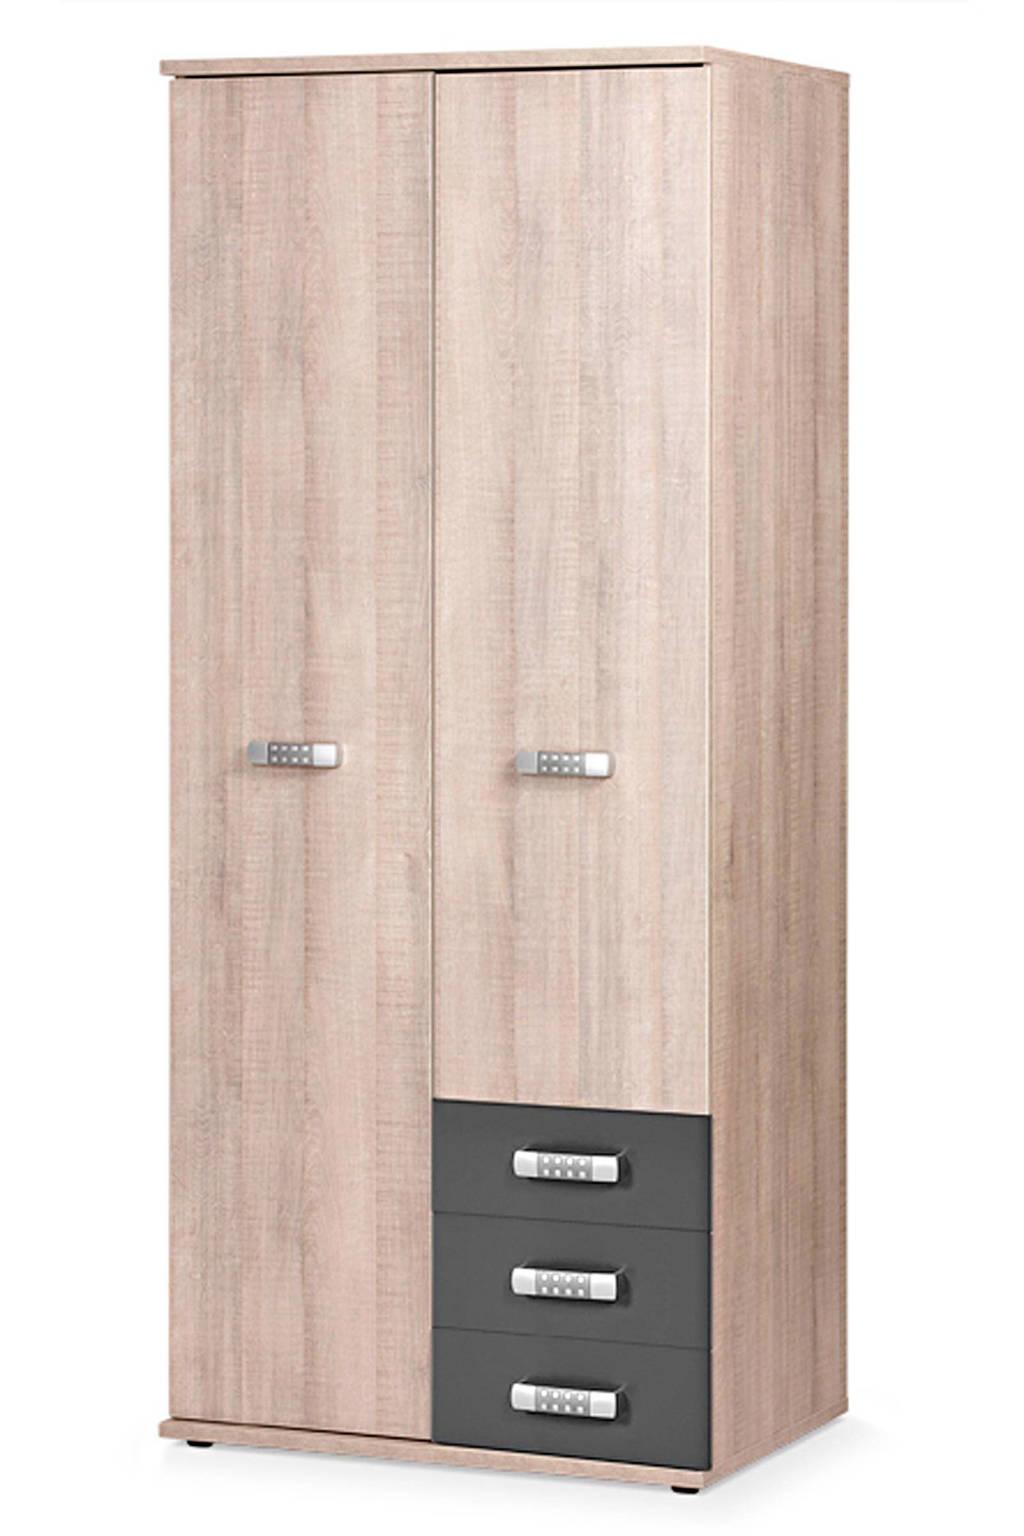 Beter Bed 2-deurs kledingkast wit Pep, Eiken/antraciet